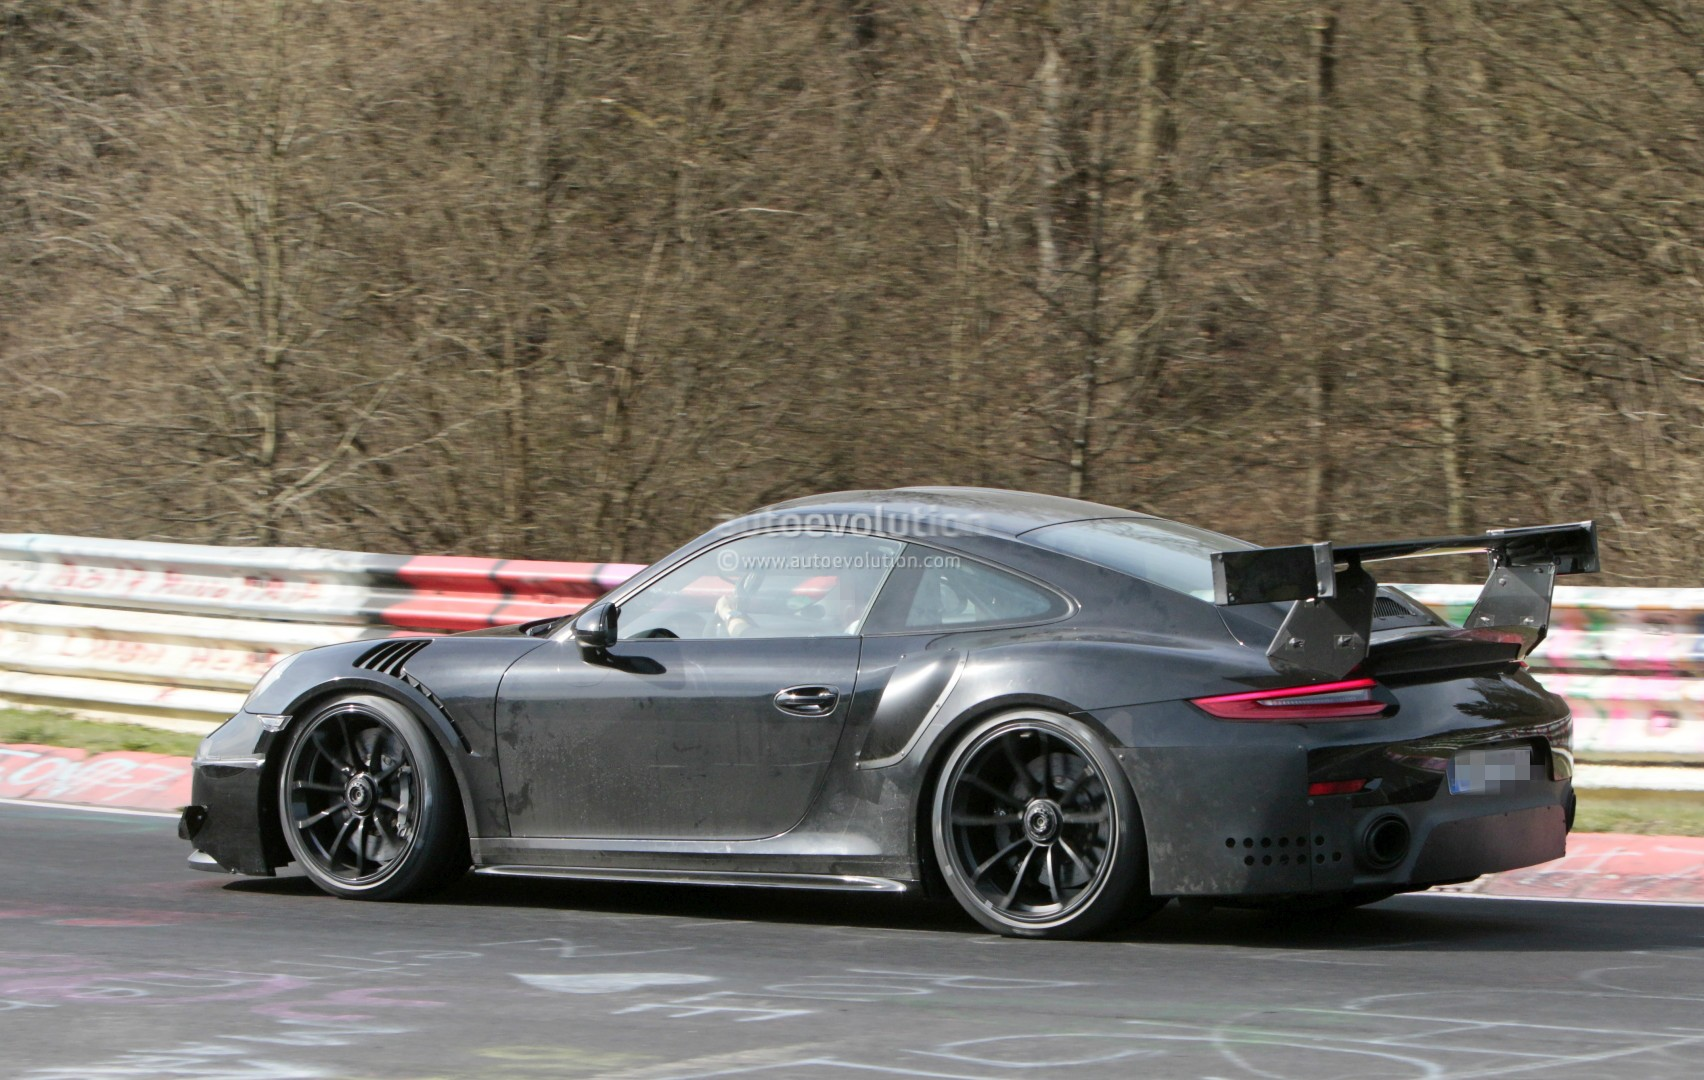 2018 porsche 911 gt2 rs revealed at e3